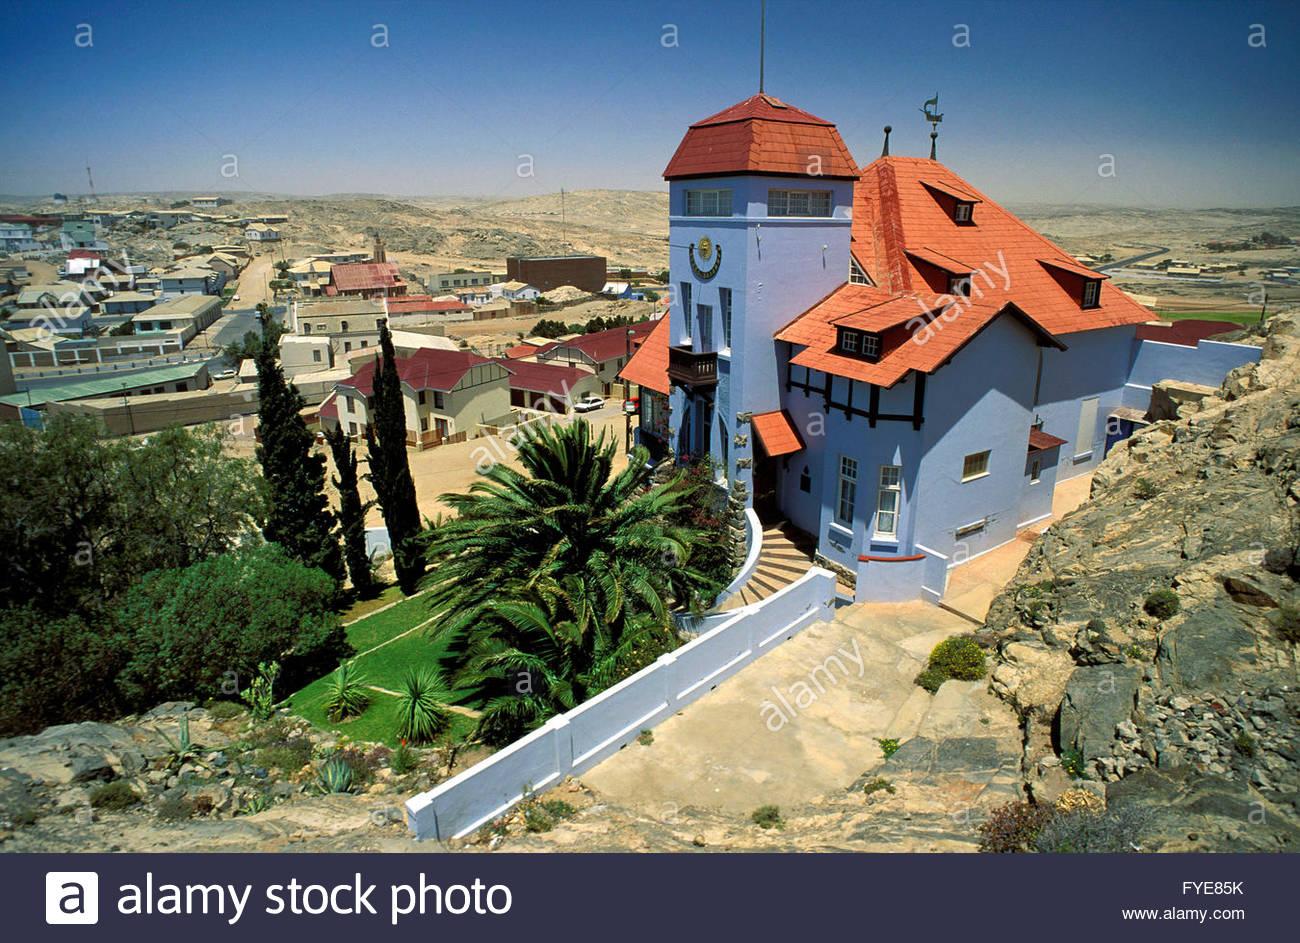 House in Luderitz Namibia. Stock Photo